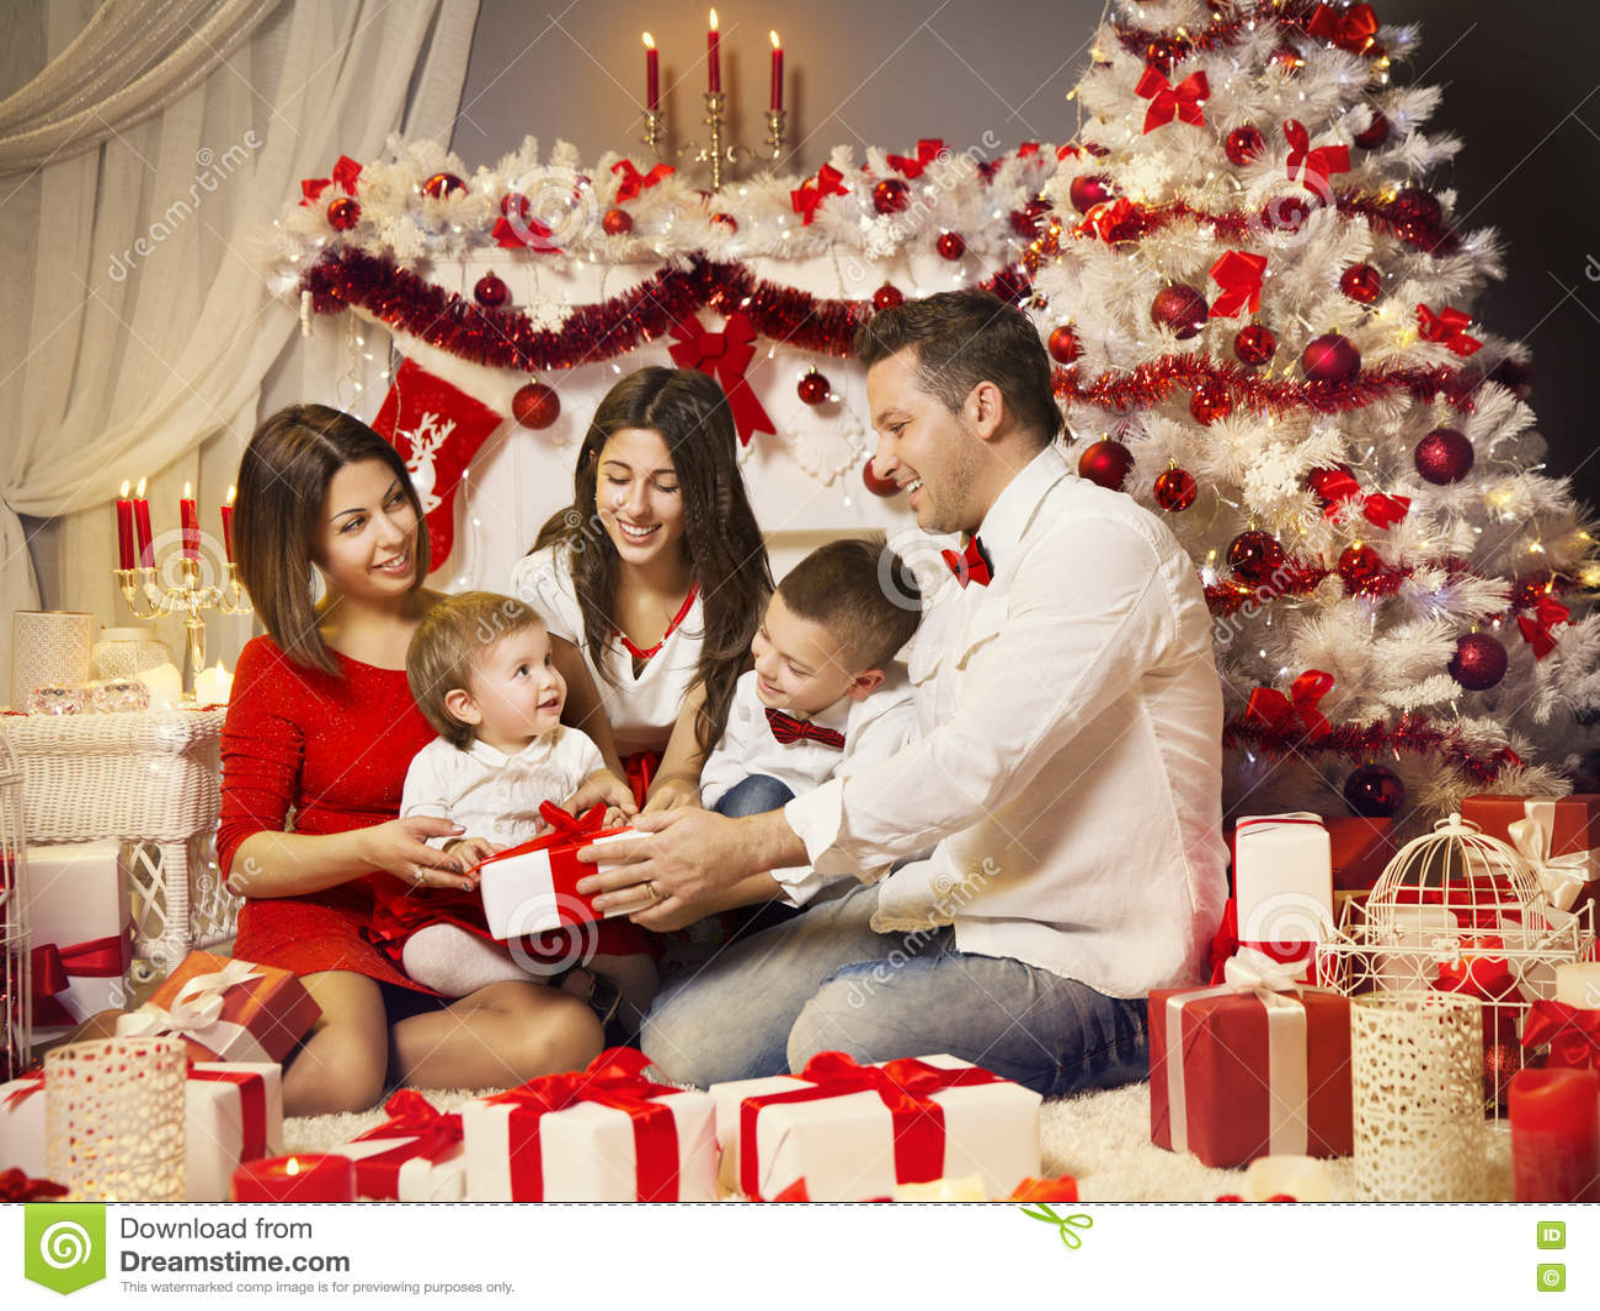 Christmas Family Photo Christmas Family Opening Present Gift Box Xmas Celebration Stock